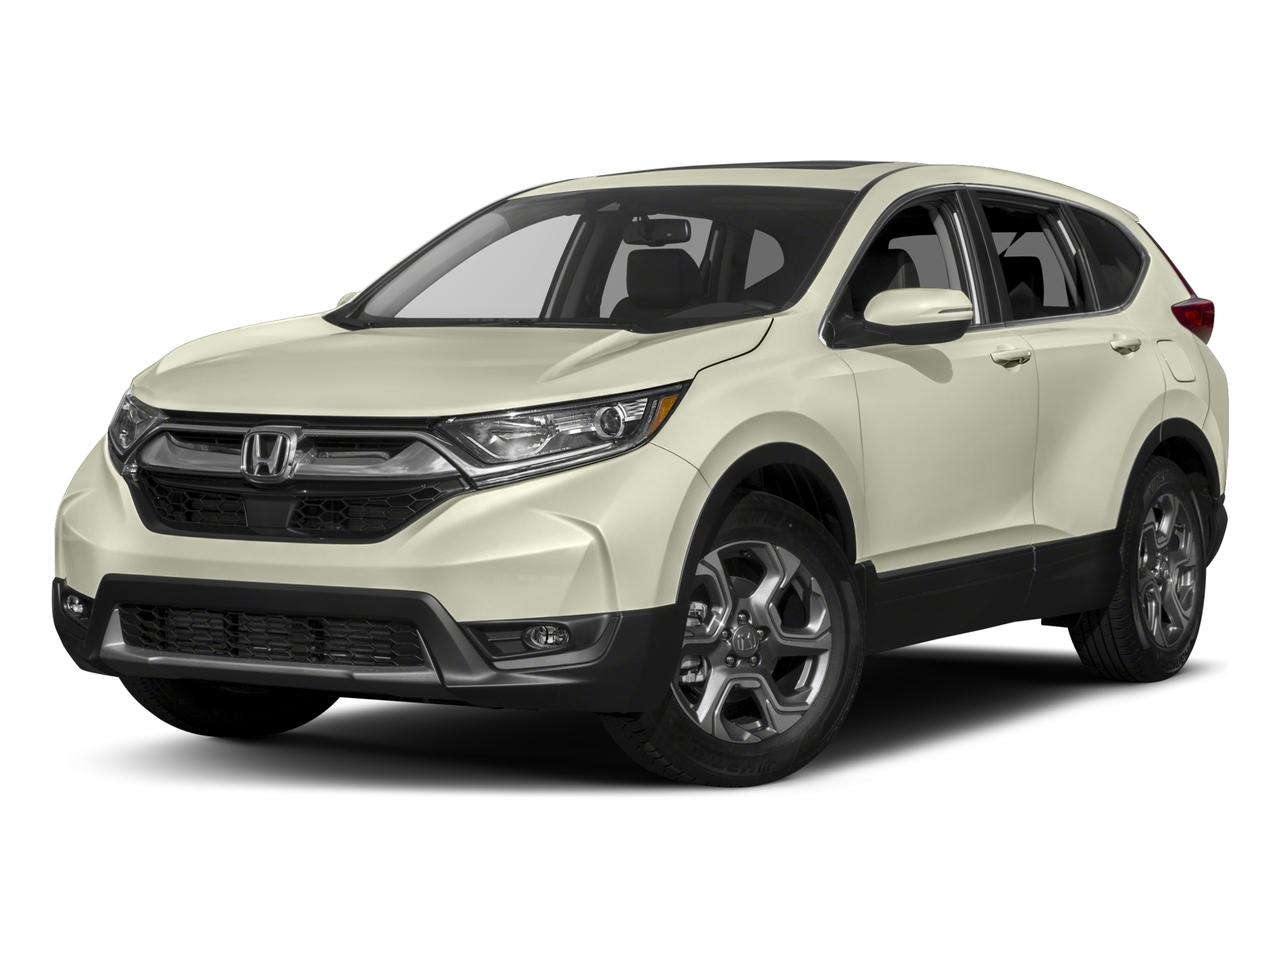 2017 Honda CR-V Vehicle Photo in ANAHEIM, CA 92806-5612